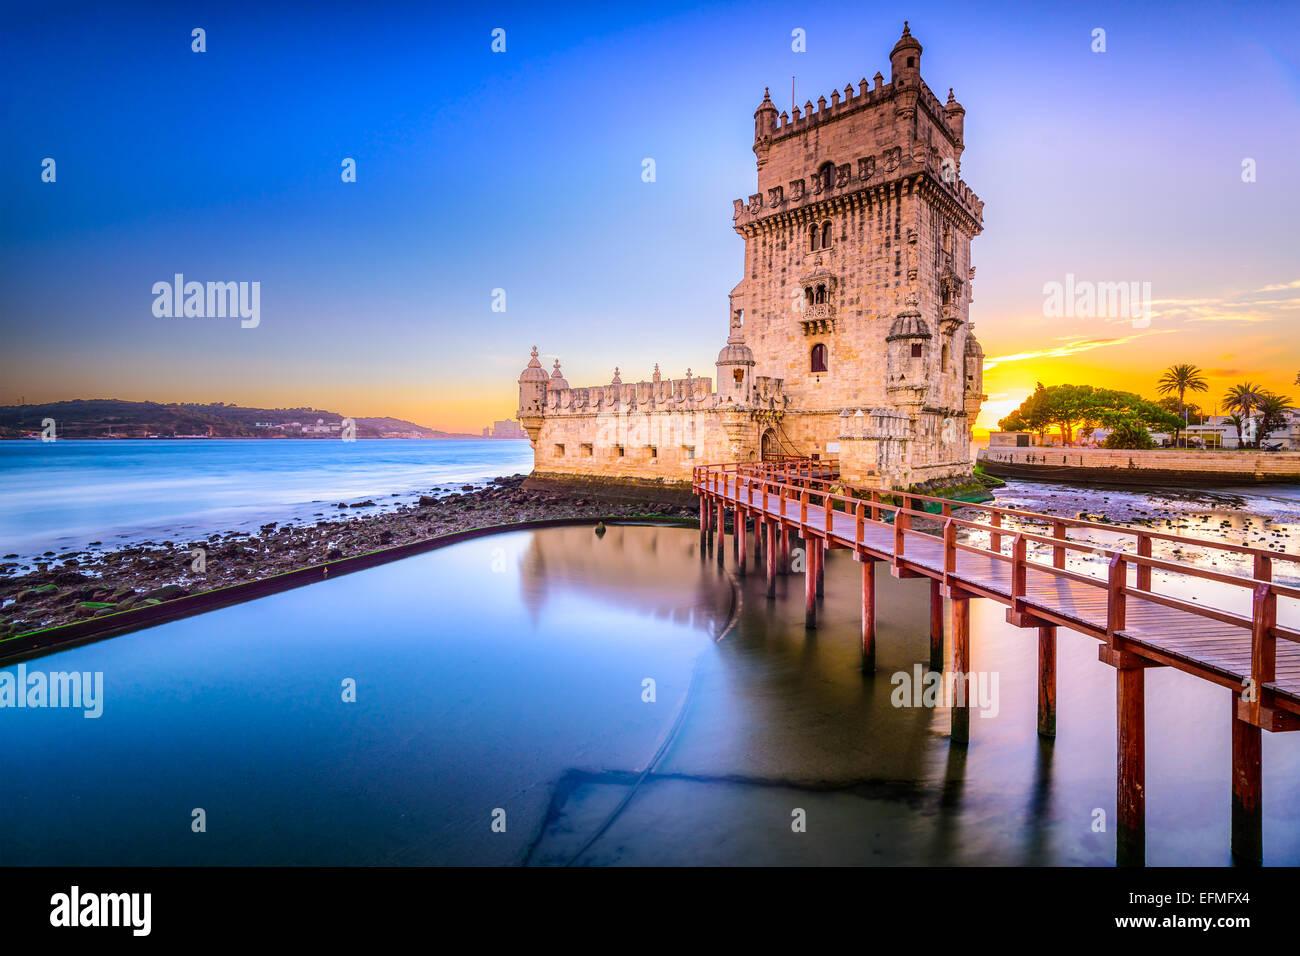 Lisboa, Portugal en Torre de Belem en el río Tajo. Foto de stock